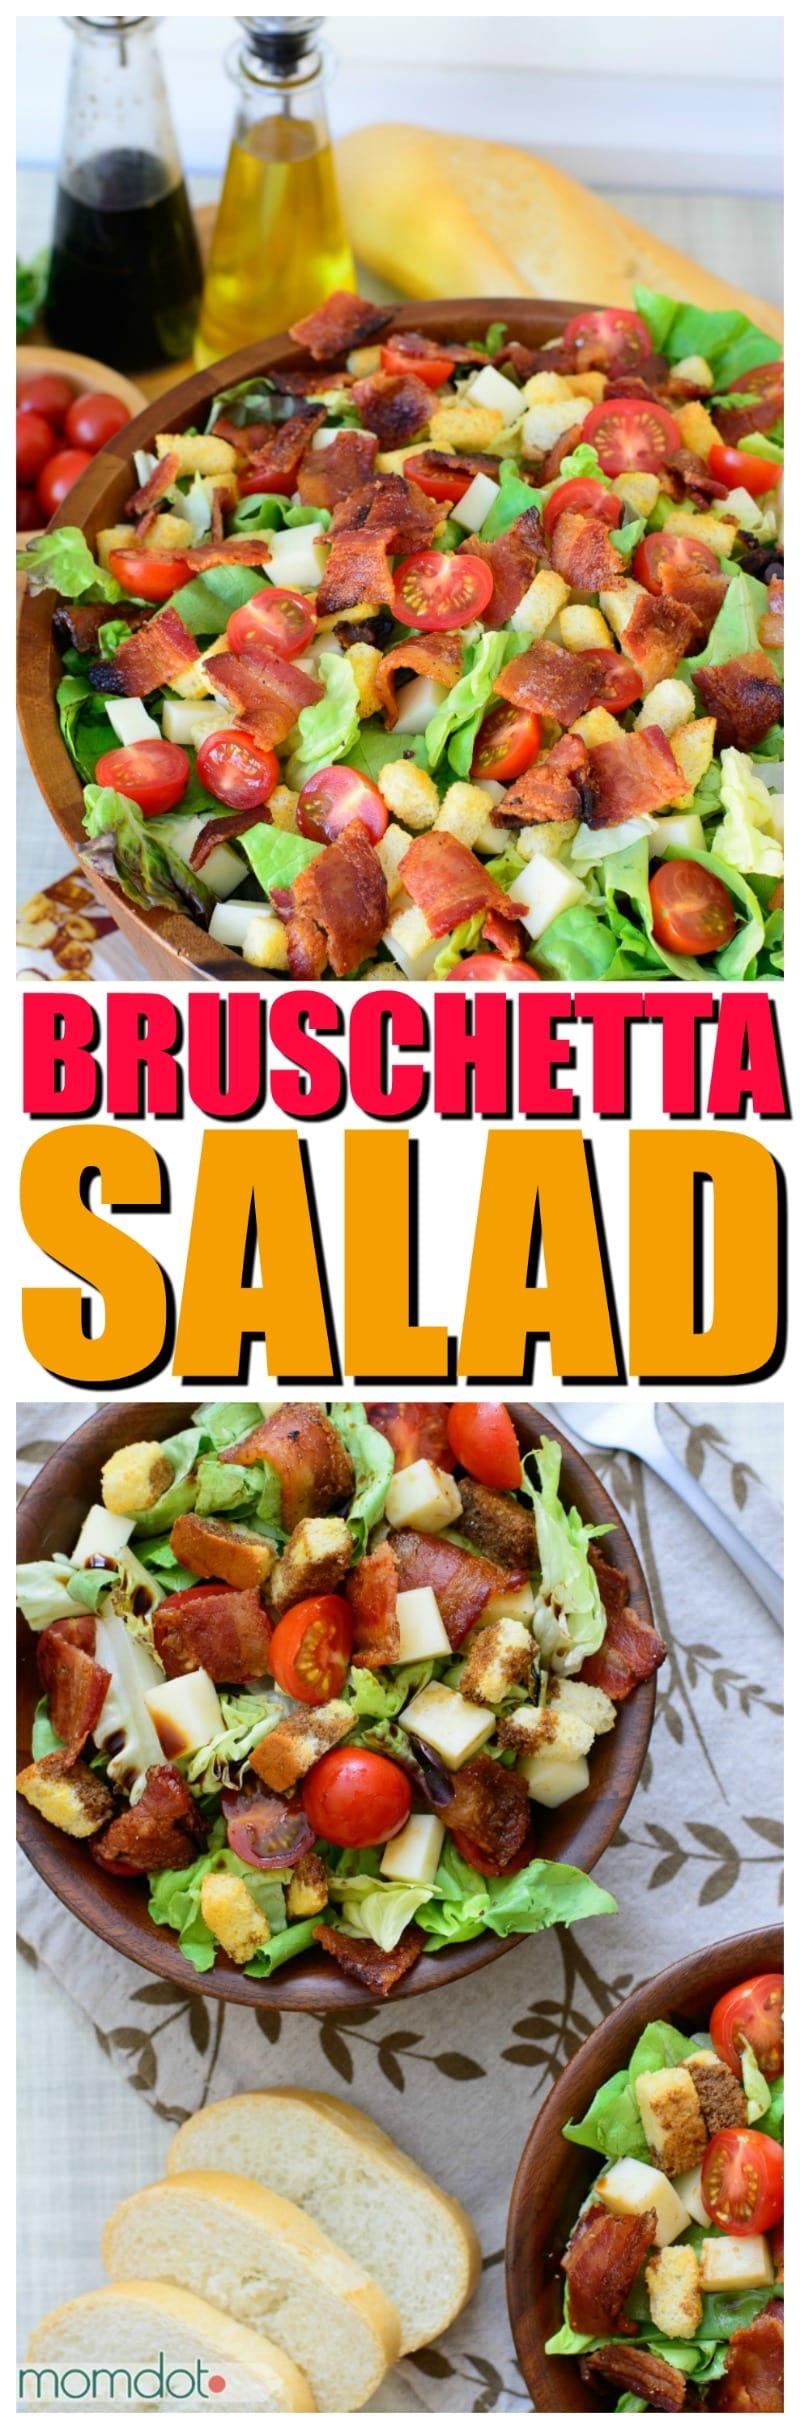 Bruschetta salad : Easy Delicious Veggie Dinner or Side dish Option | Best Salad Option | #salad #recipes #saladbowl #saladrecipes